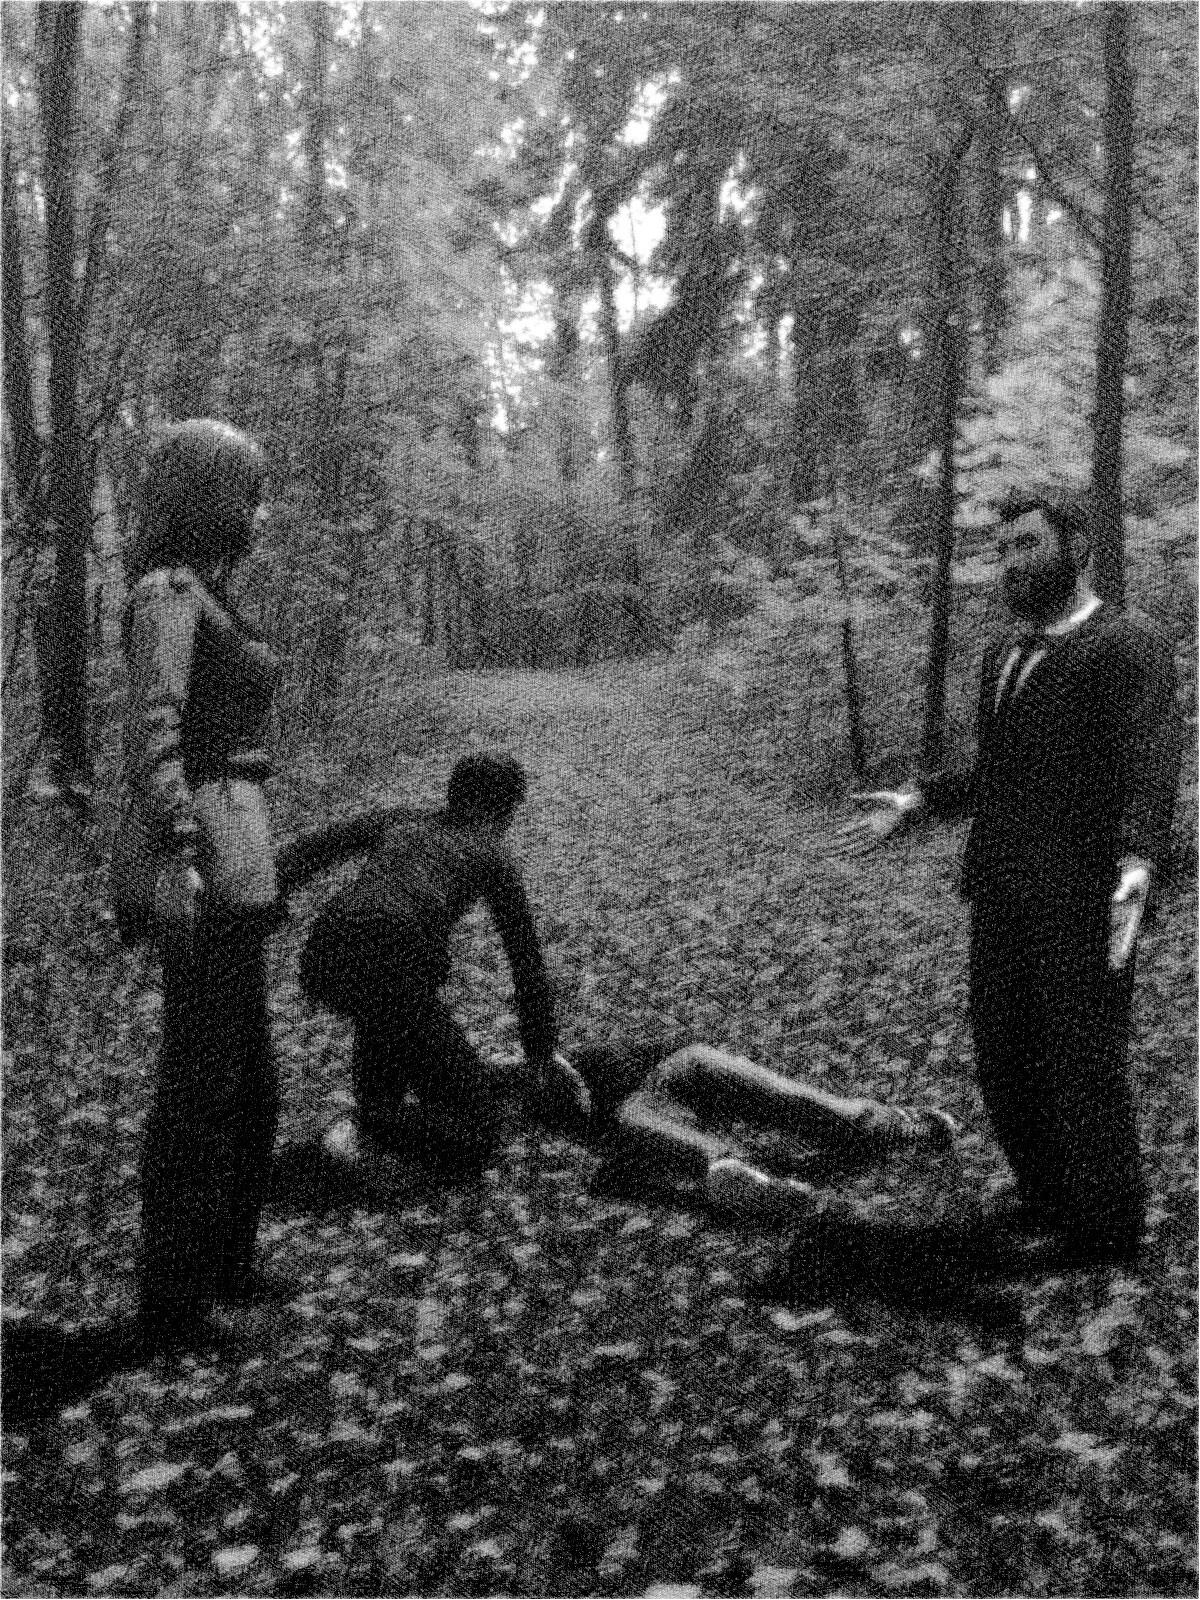 Strange deaths in a wood